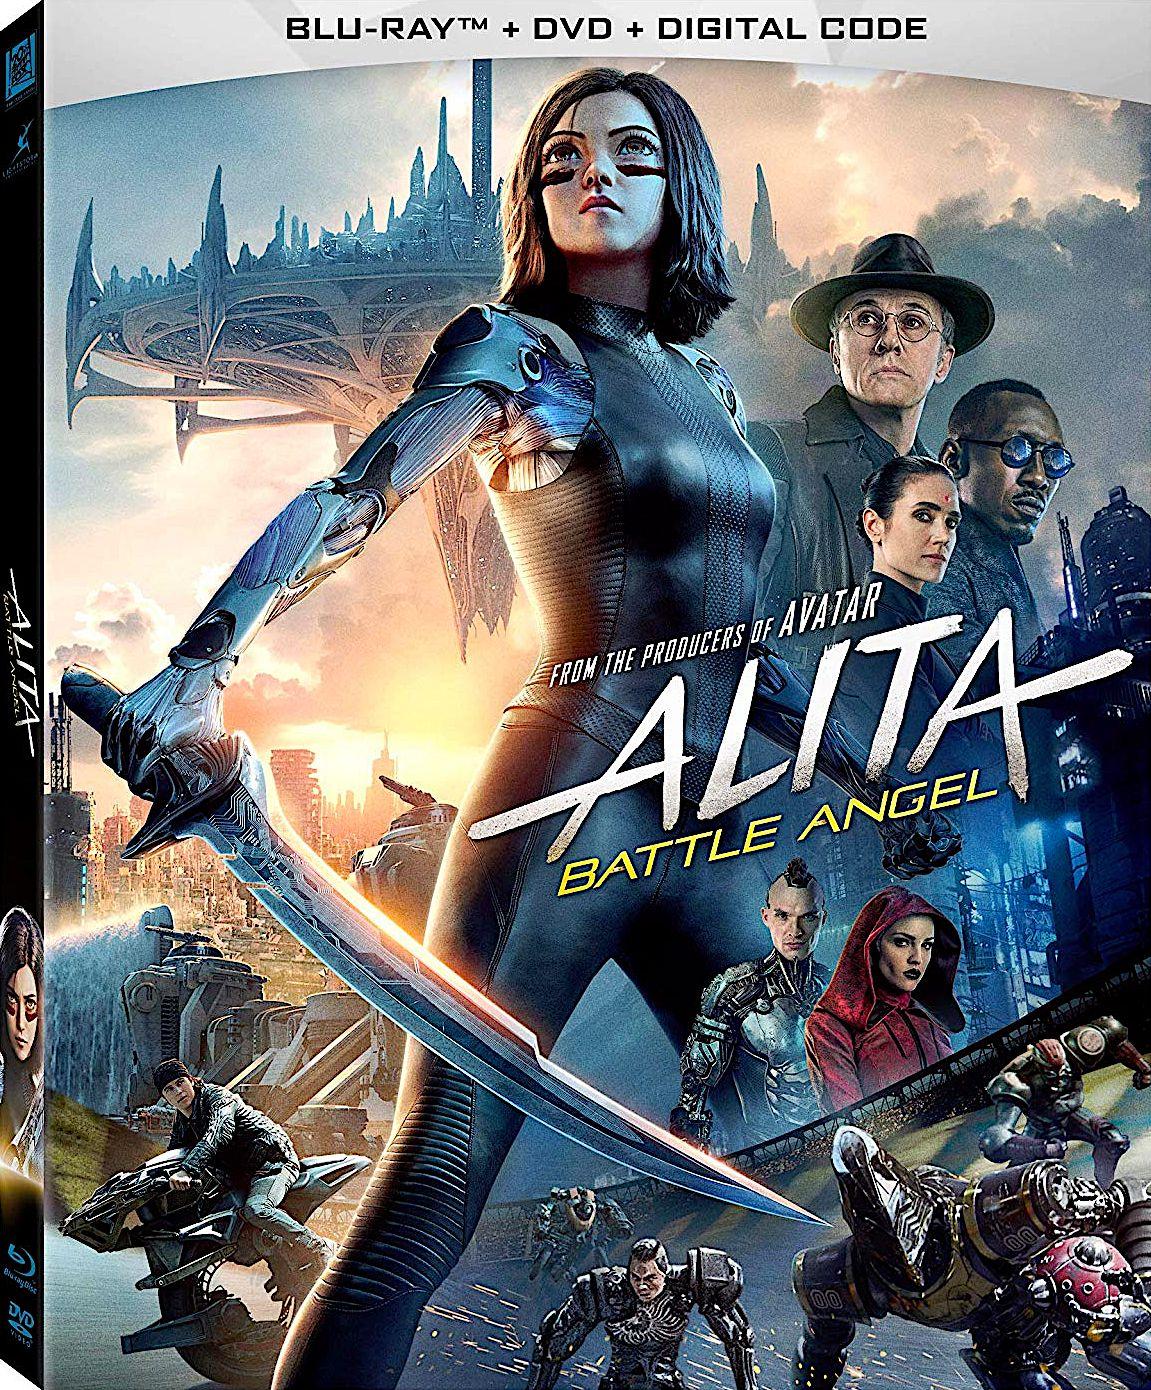 Alita Battle Angel Blu Ray 20th Century Fox Angel Movie Battle Battle Angel Alita